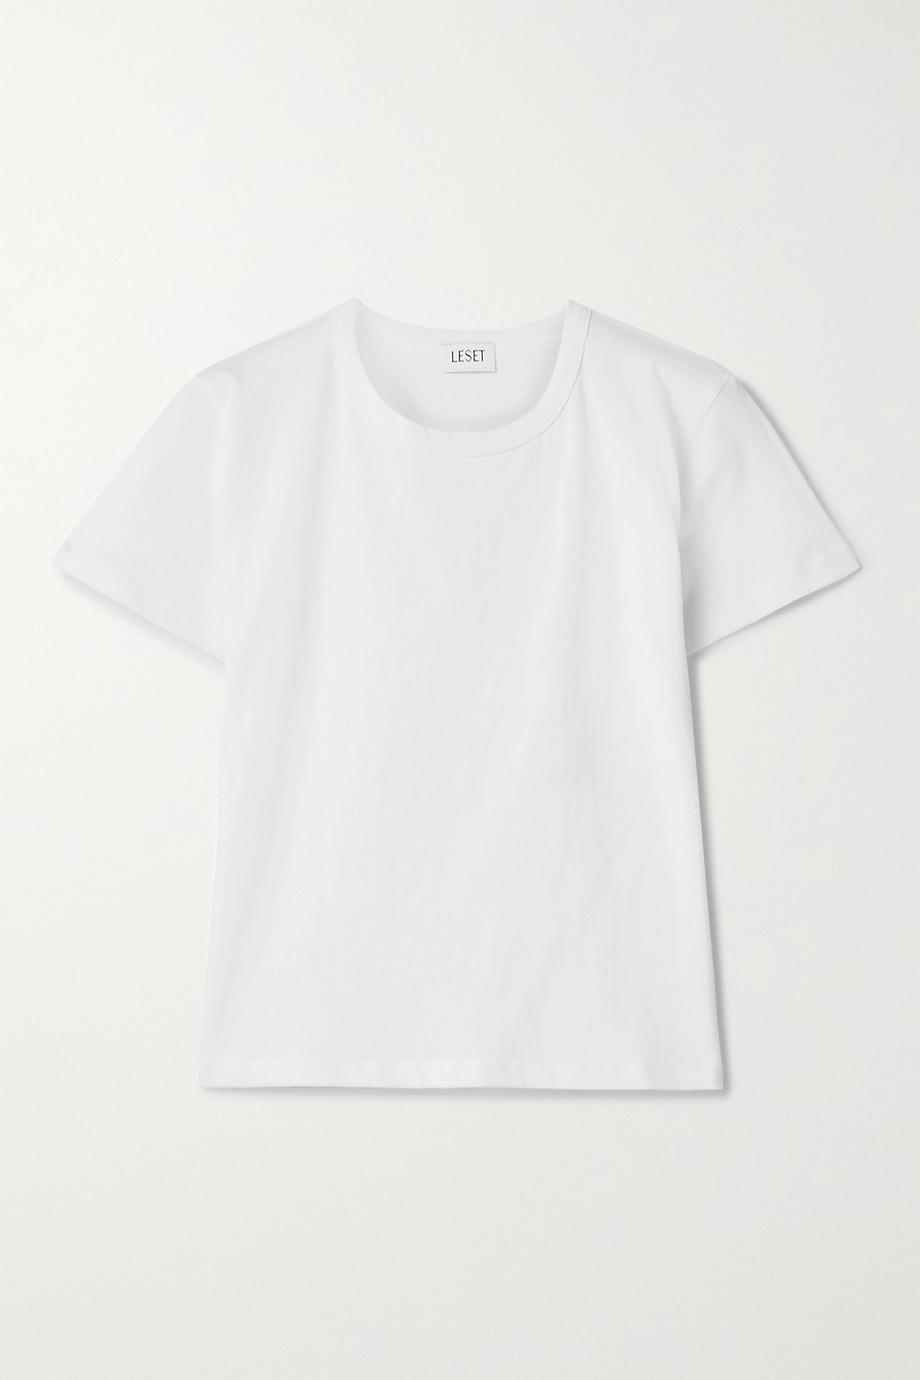 LESET Margo T-Shirt aus Baumwoll-Jersey